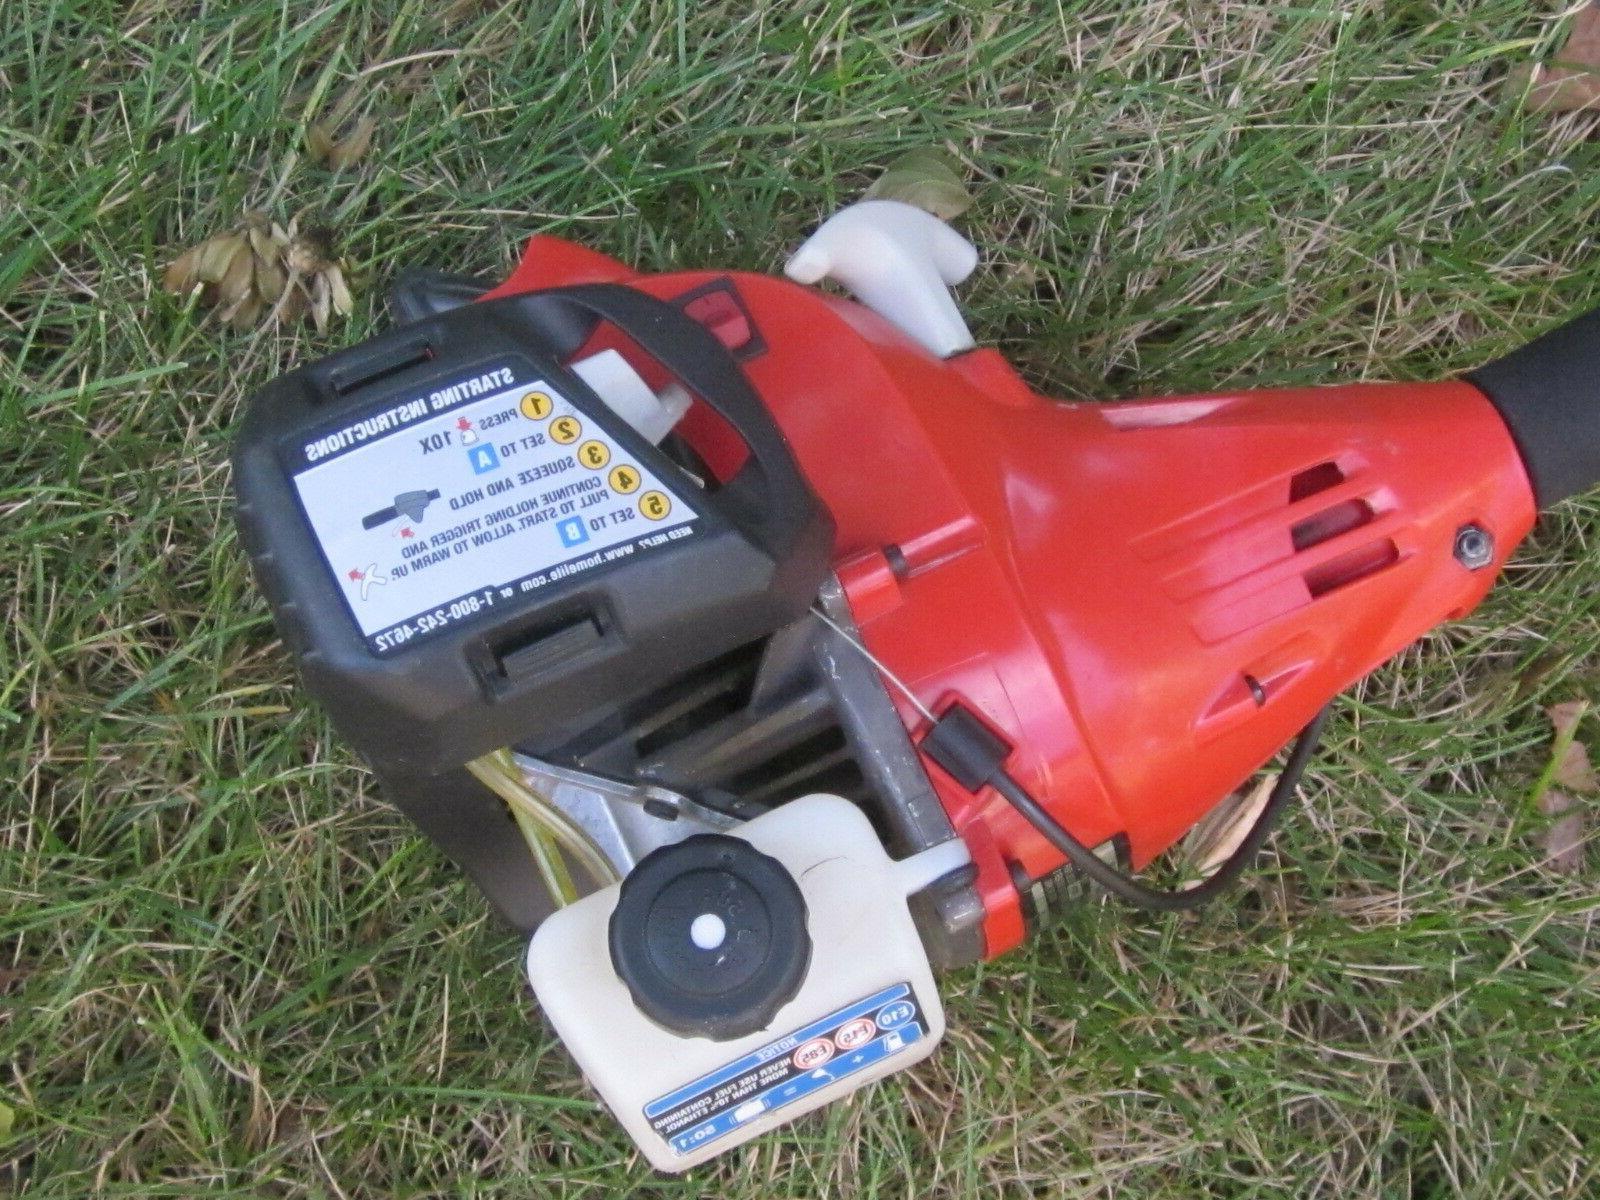 Homelite ZR33650 26cc Powered Shaft Trimmer